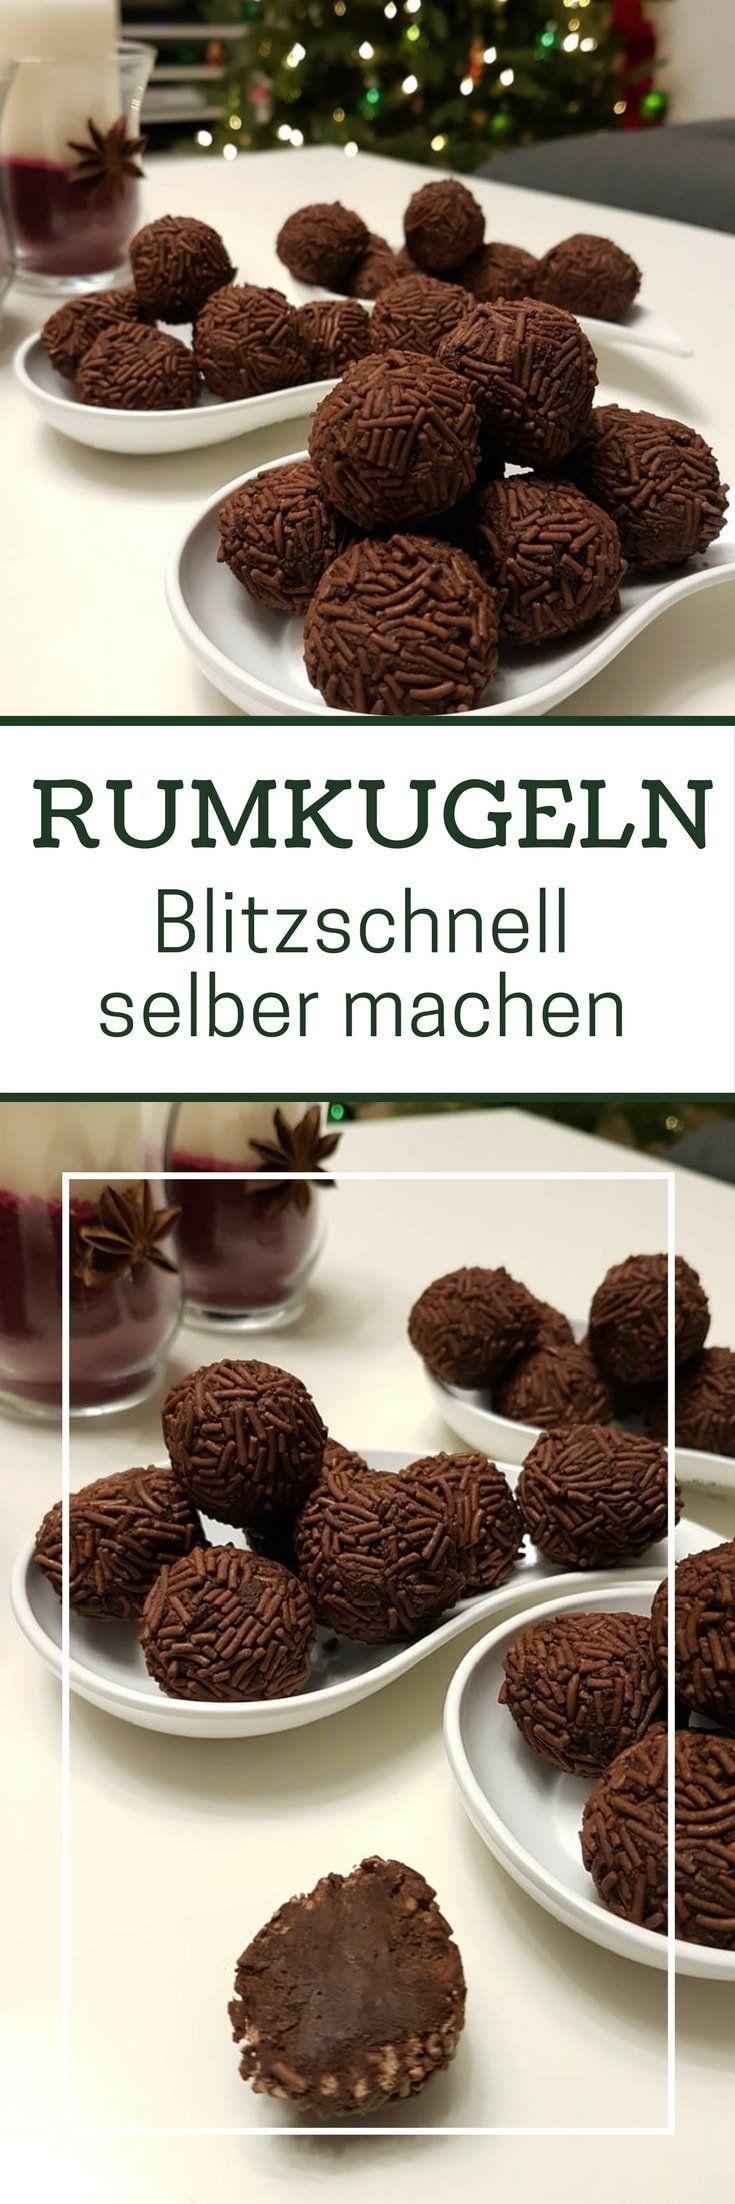 Rezept: Rumkugeln aus geriebener Schokolade selber machen